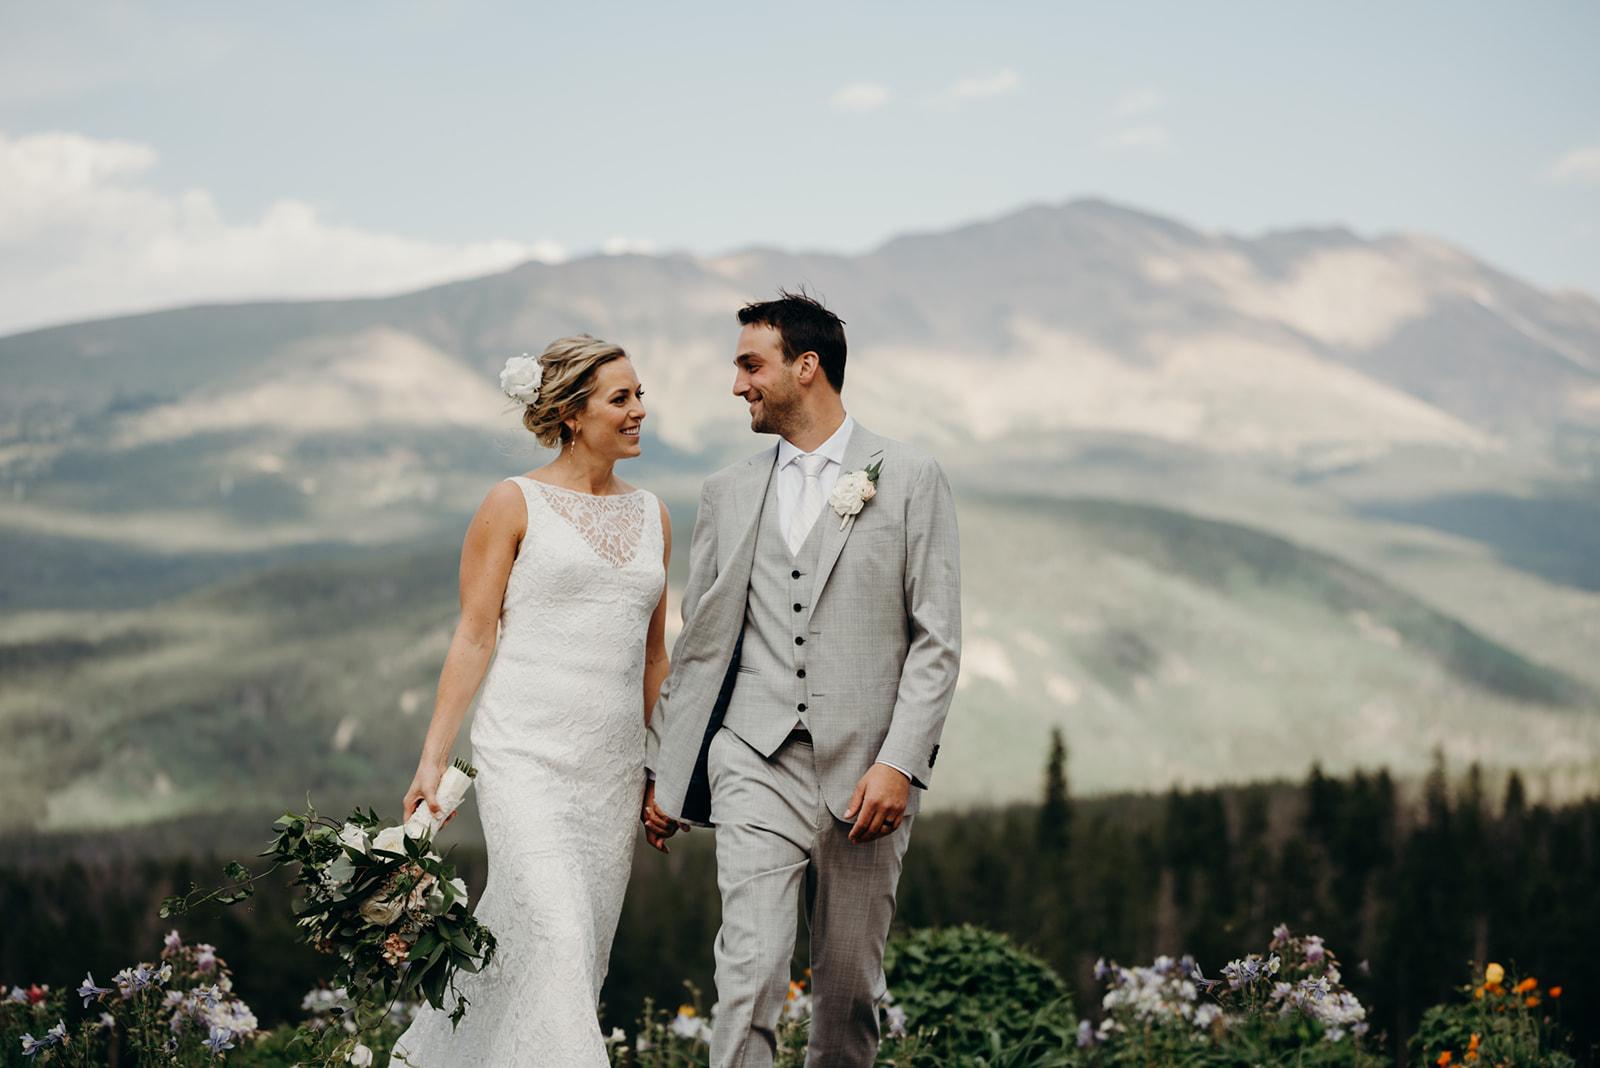 ten-mile-stadium-breckenridge-wedding-photographer-115.jpg